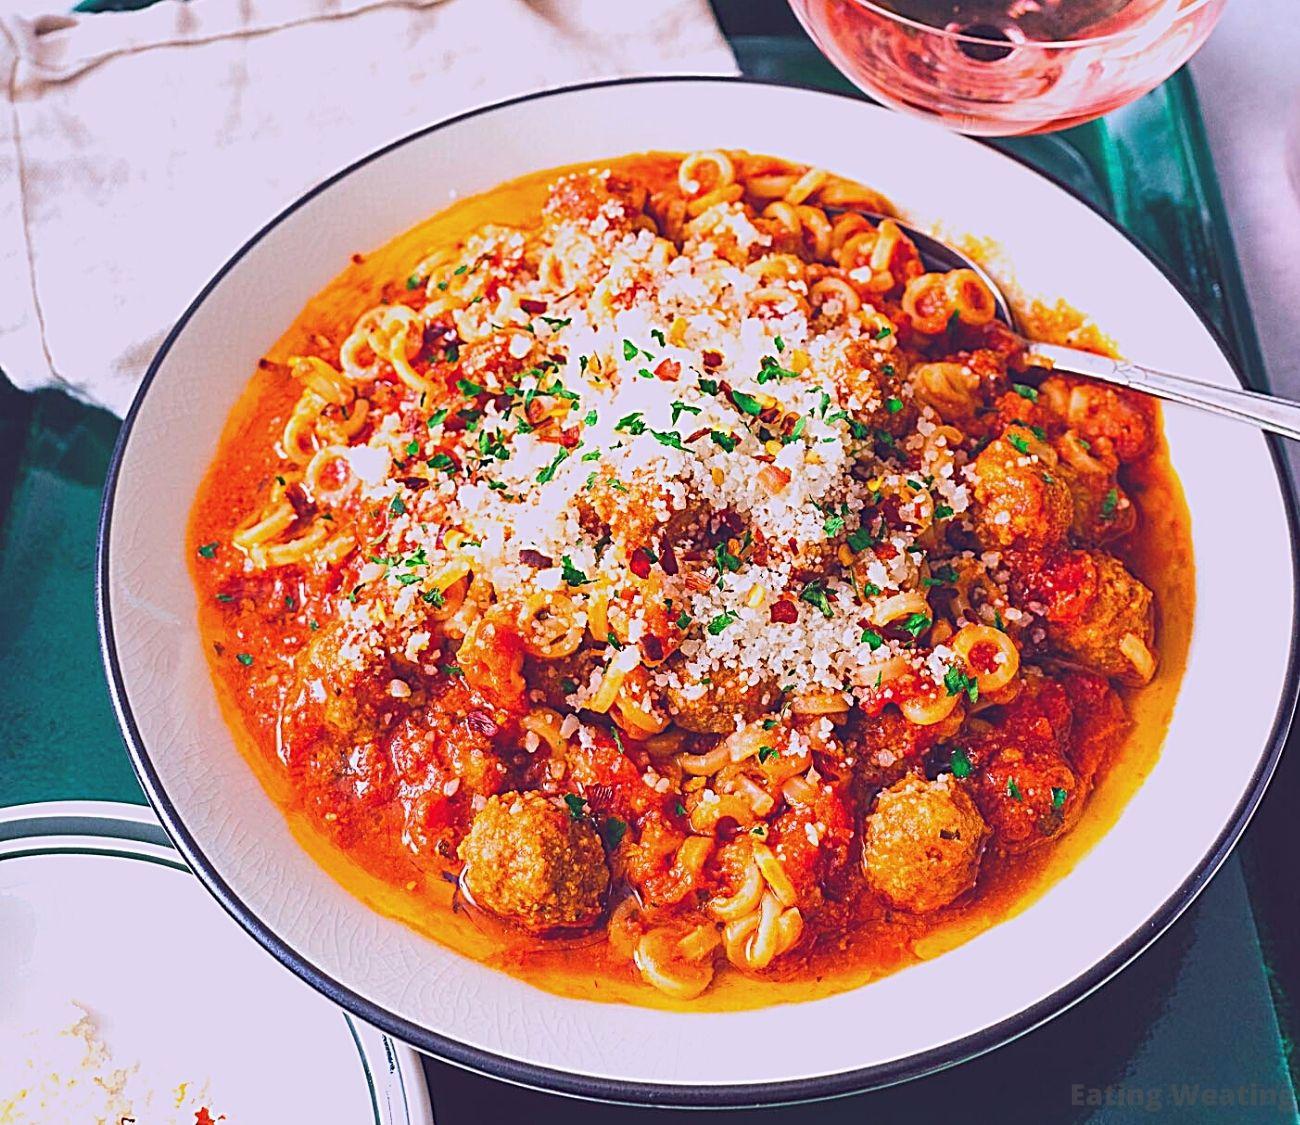 Spaghetti with Mini Meatballs